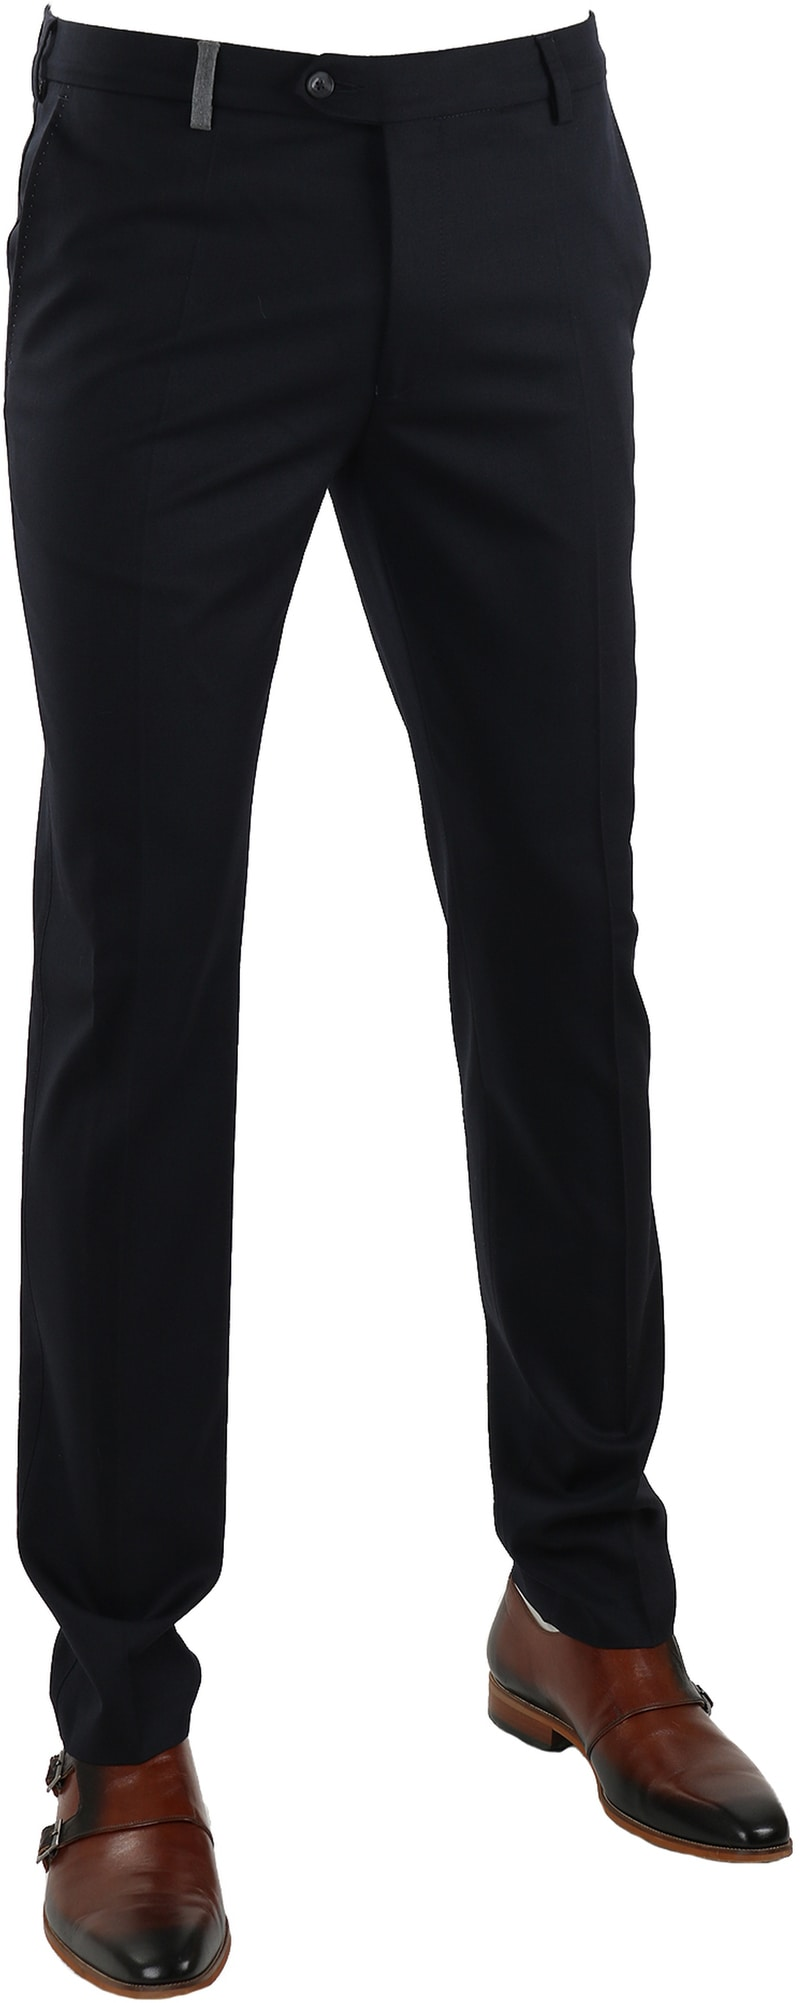 Suitable Pantalon Milano Donkerblauw  online bestellen | Suitable